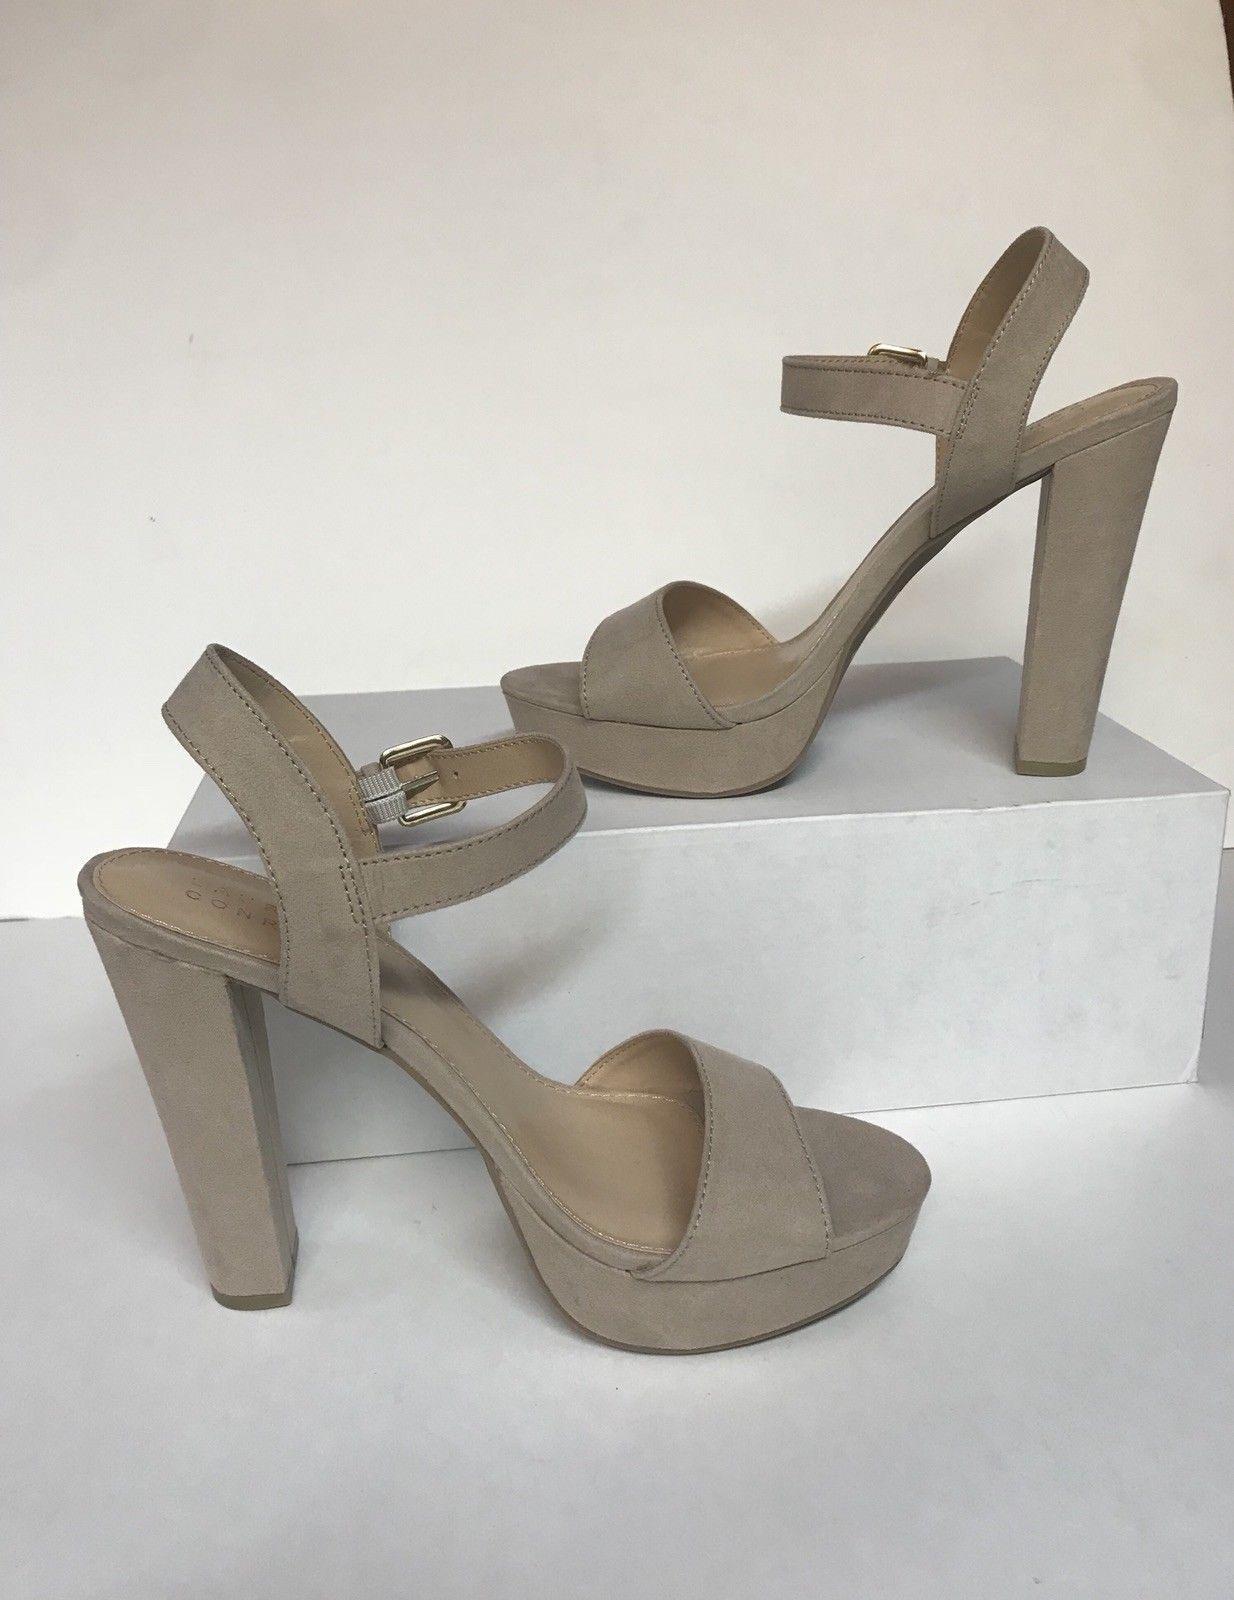 NEW Women's LC Lauren Conrad SIZE 8.5M Bow High Heel Sandals shoes Nude